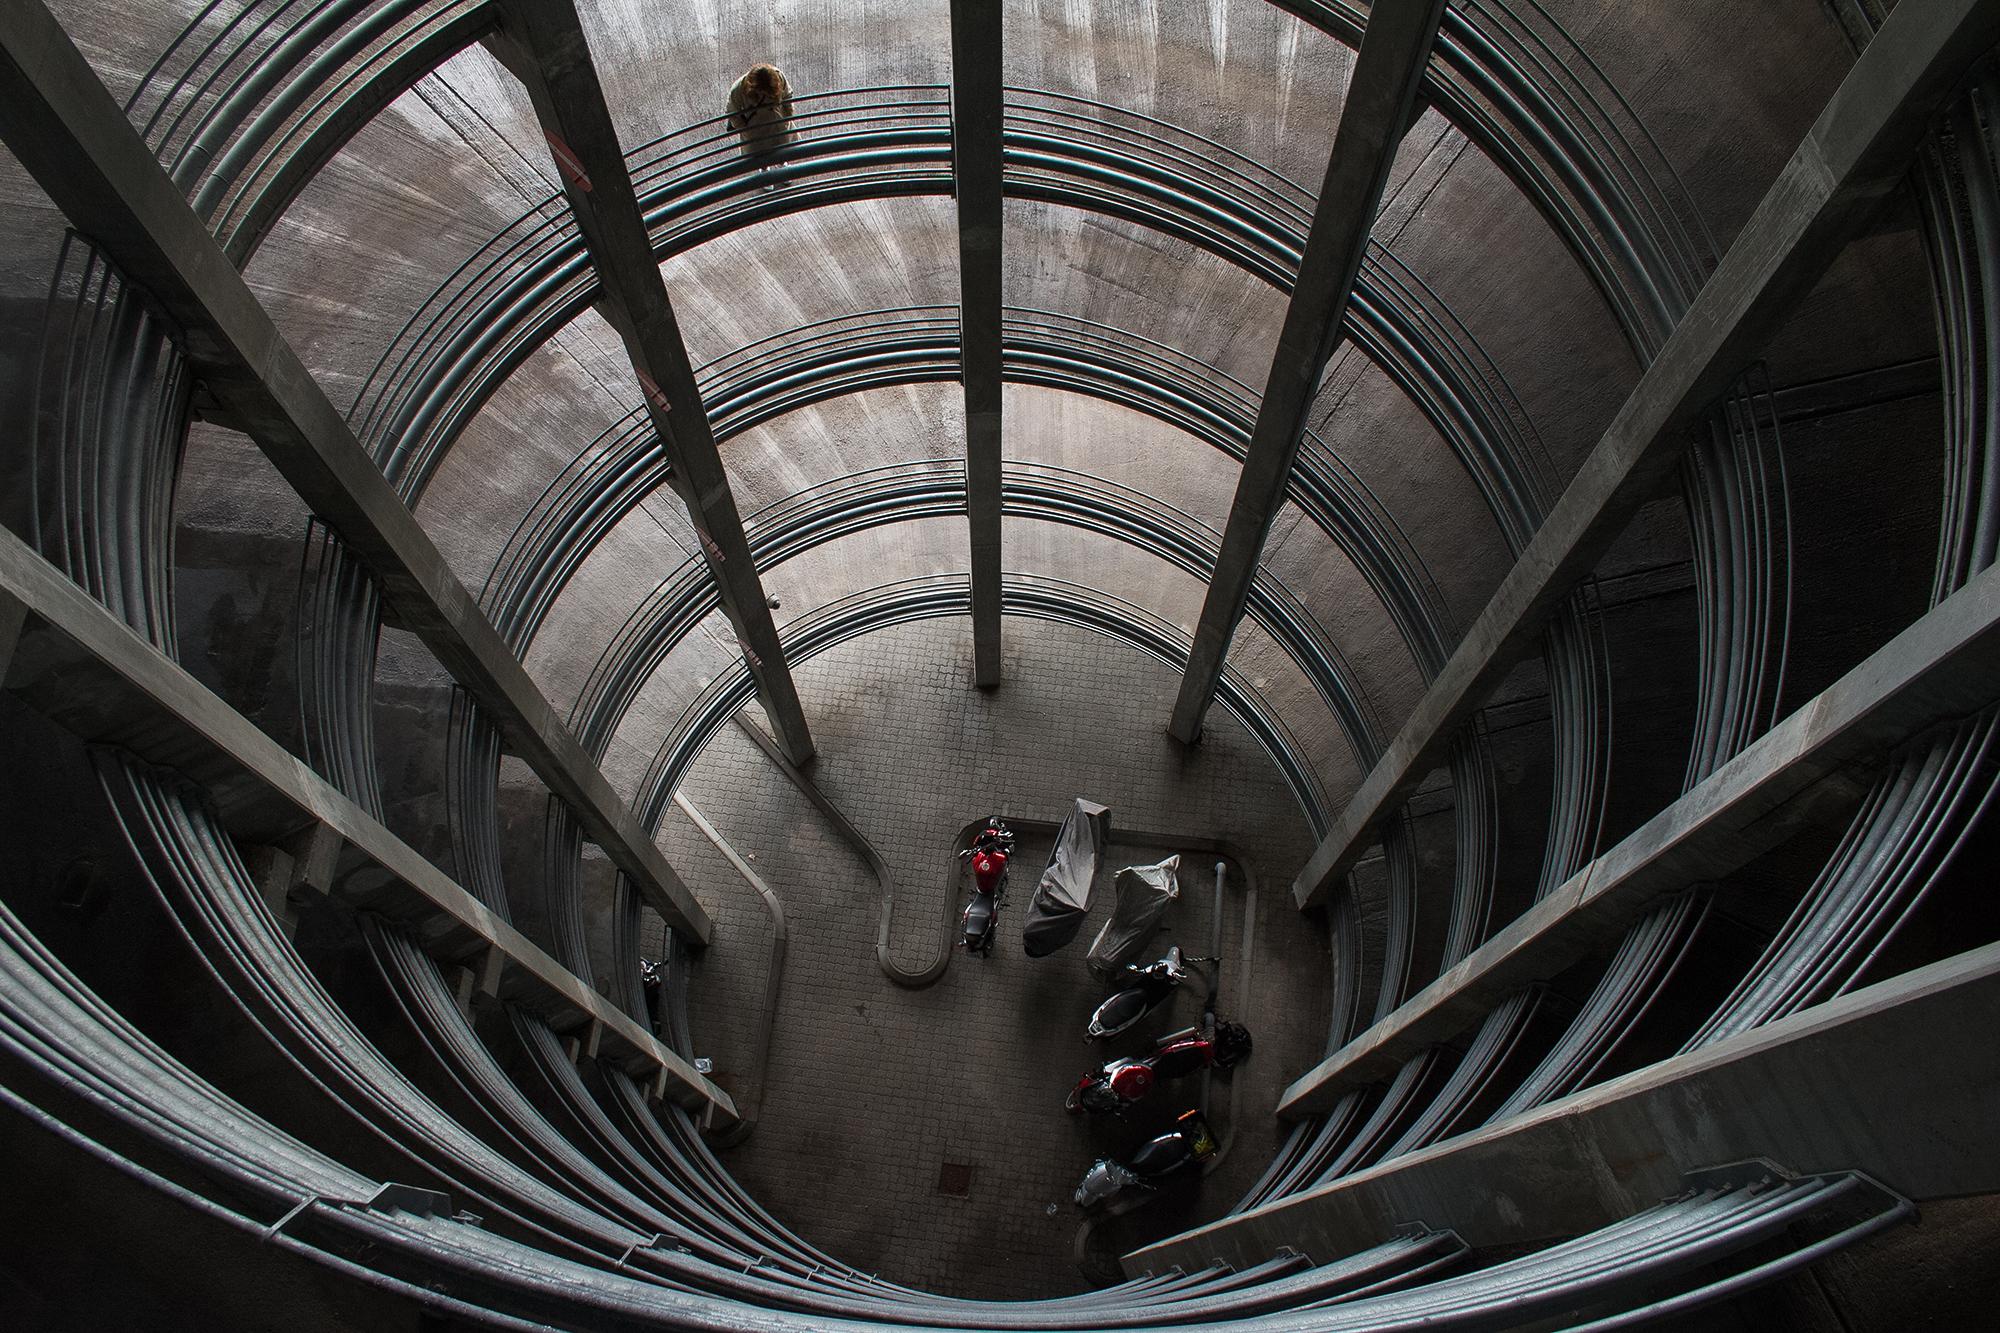 Köpenhamn JPEG_web 2.jpg